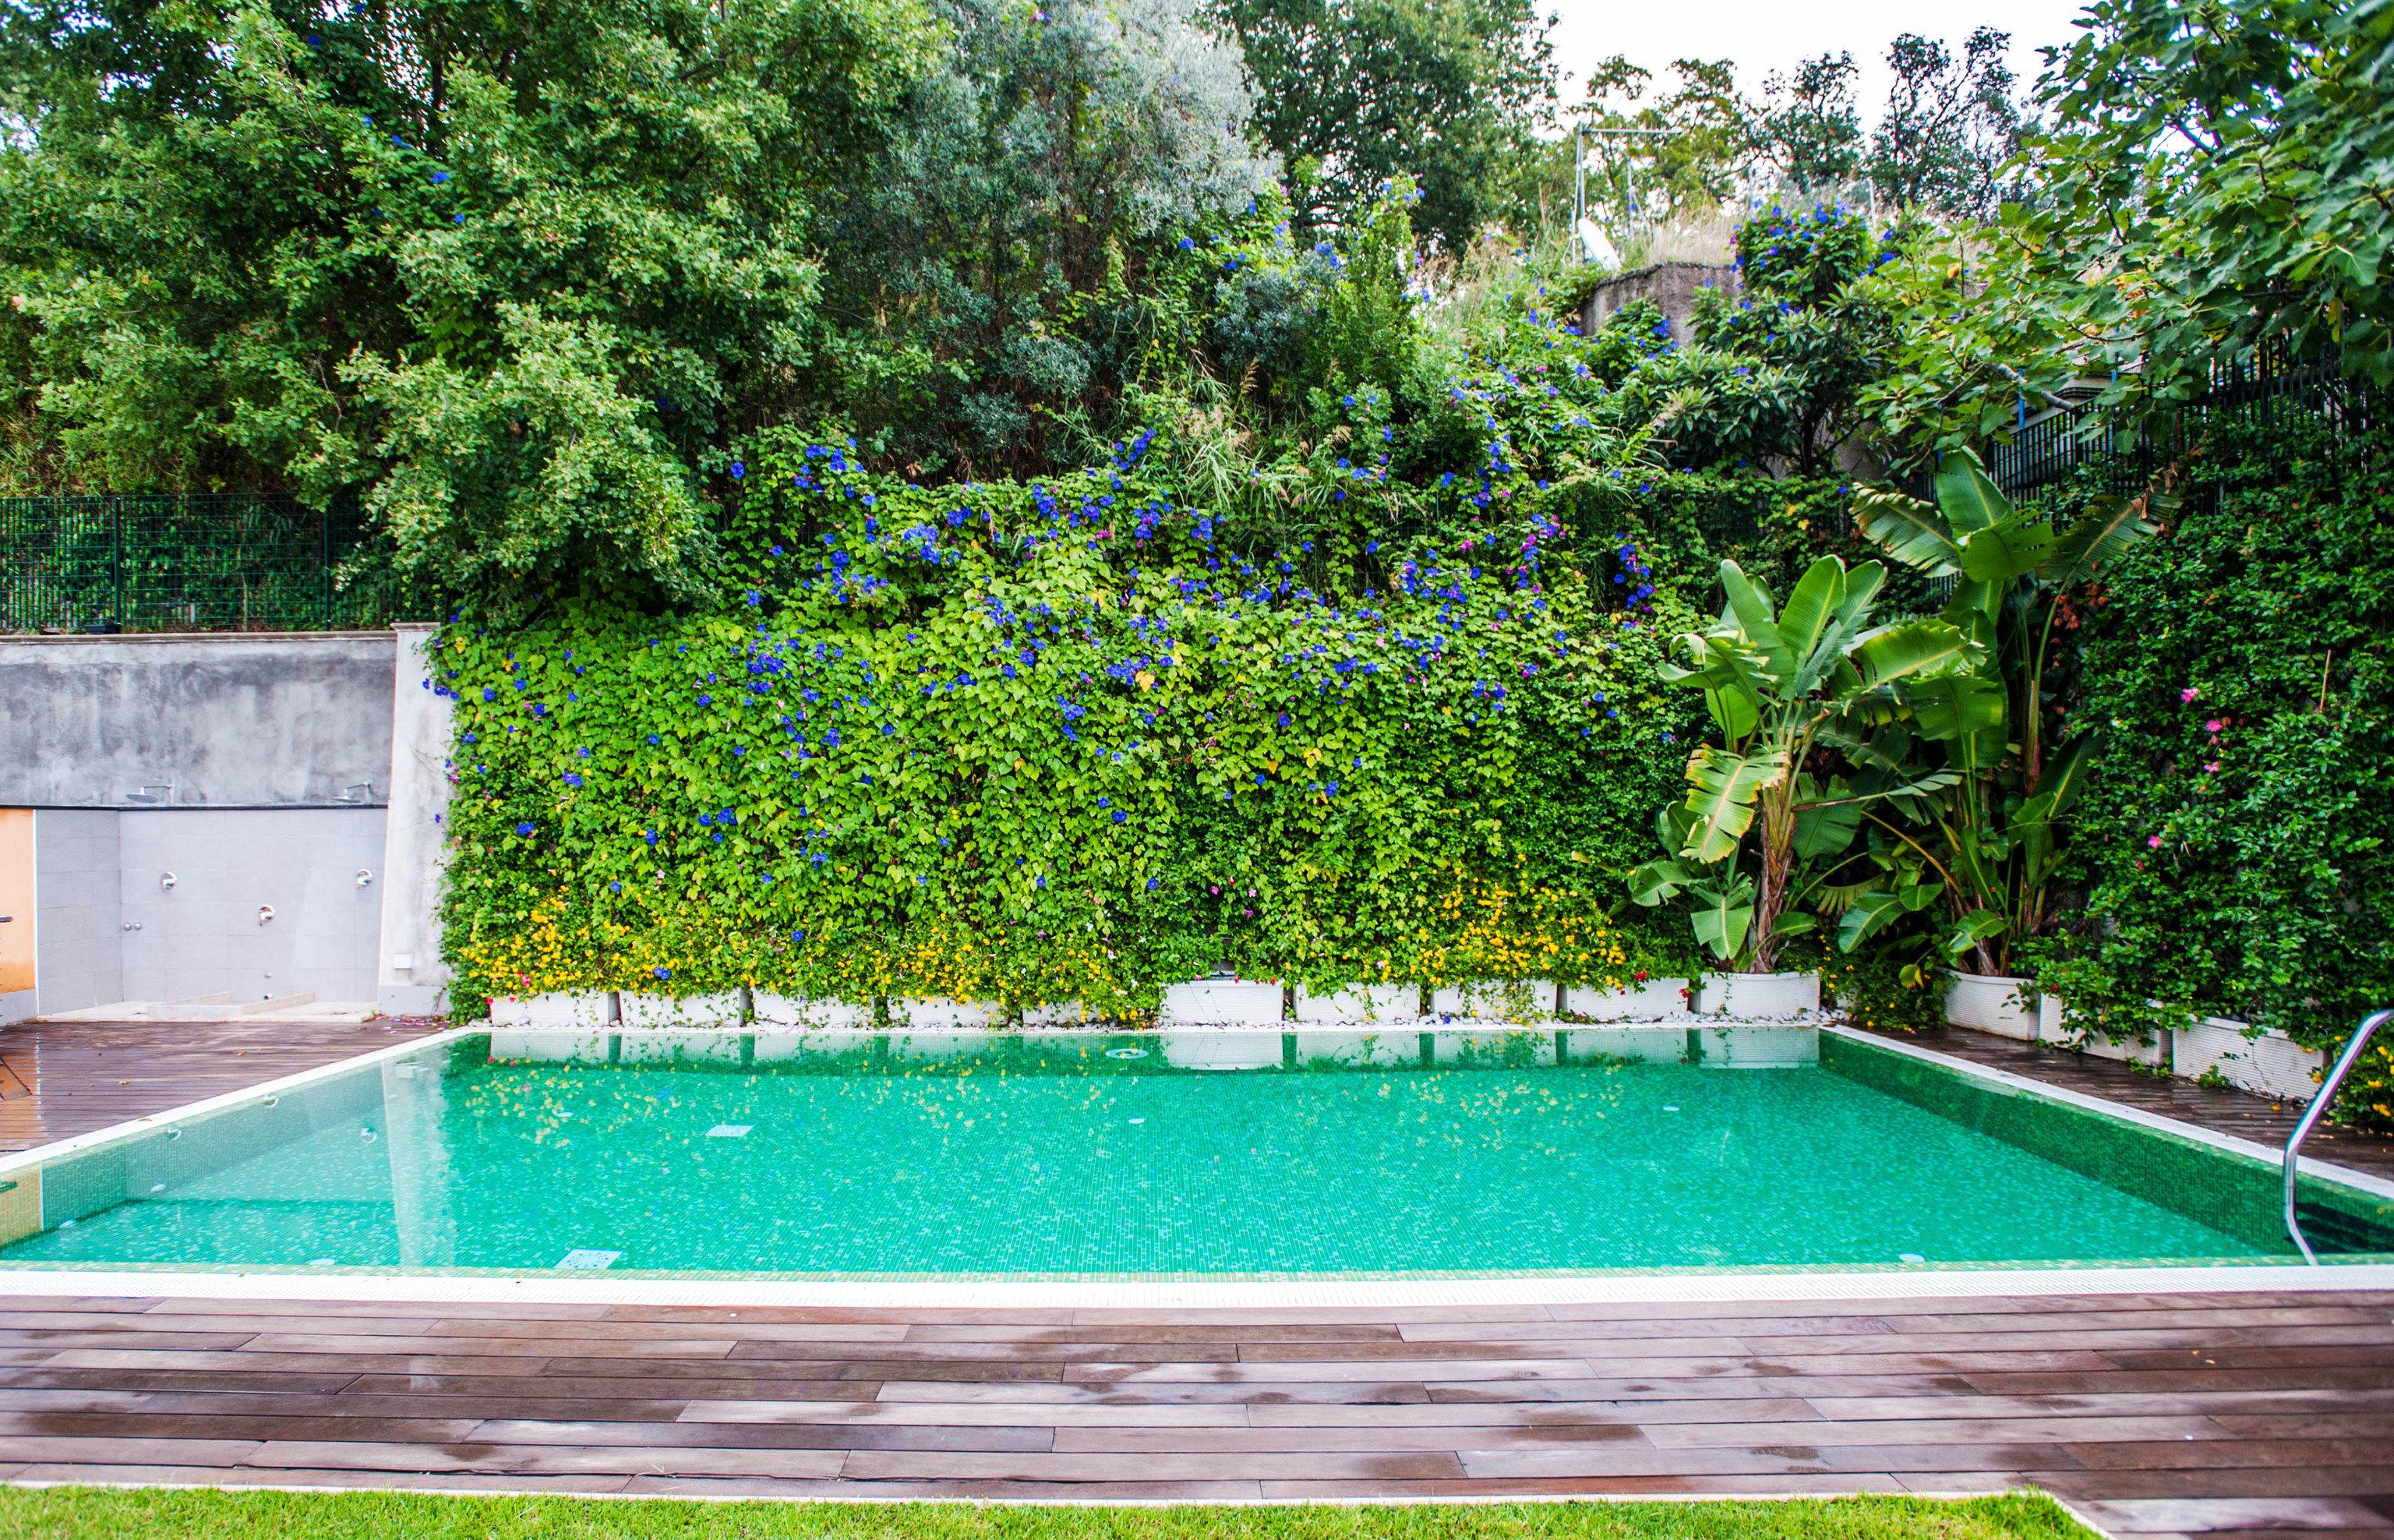 tree swimming pool property backyard Garden reflecting pool green yard landscape architect lawn Villa